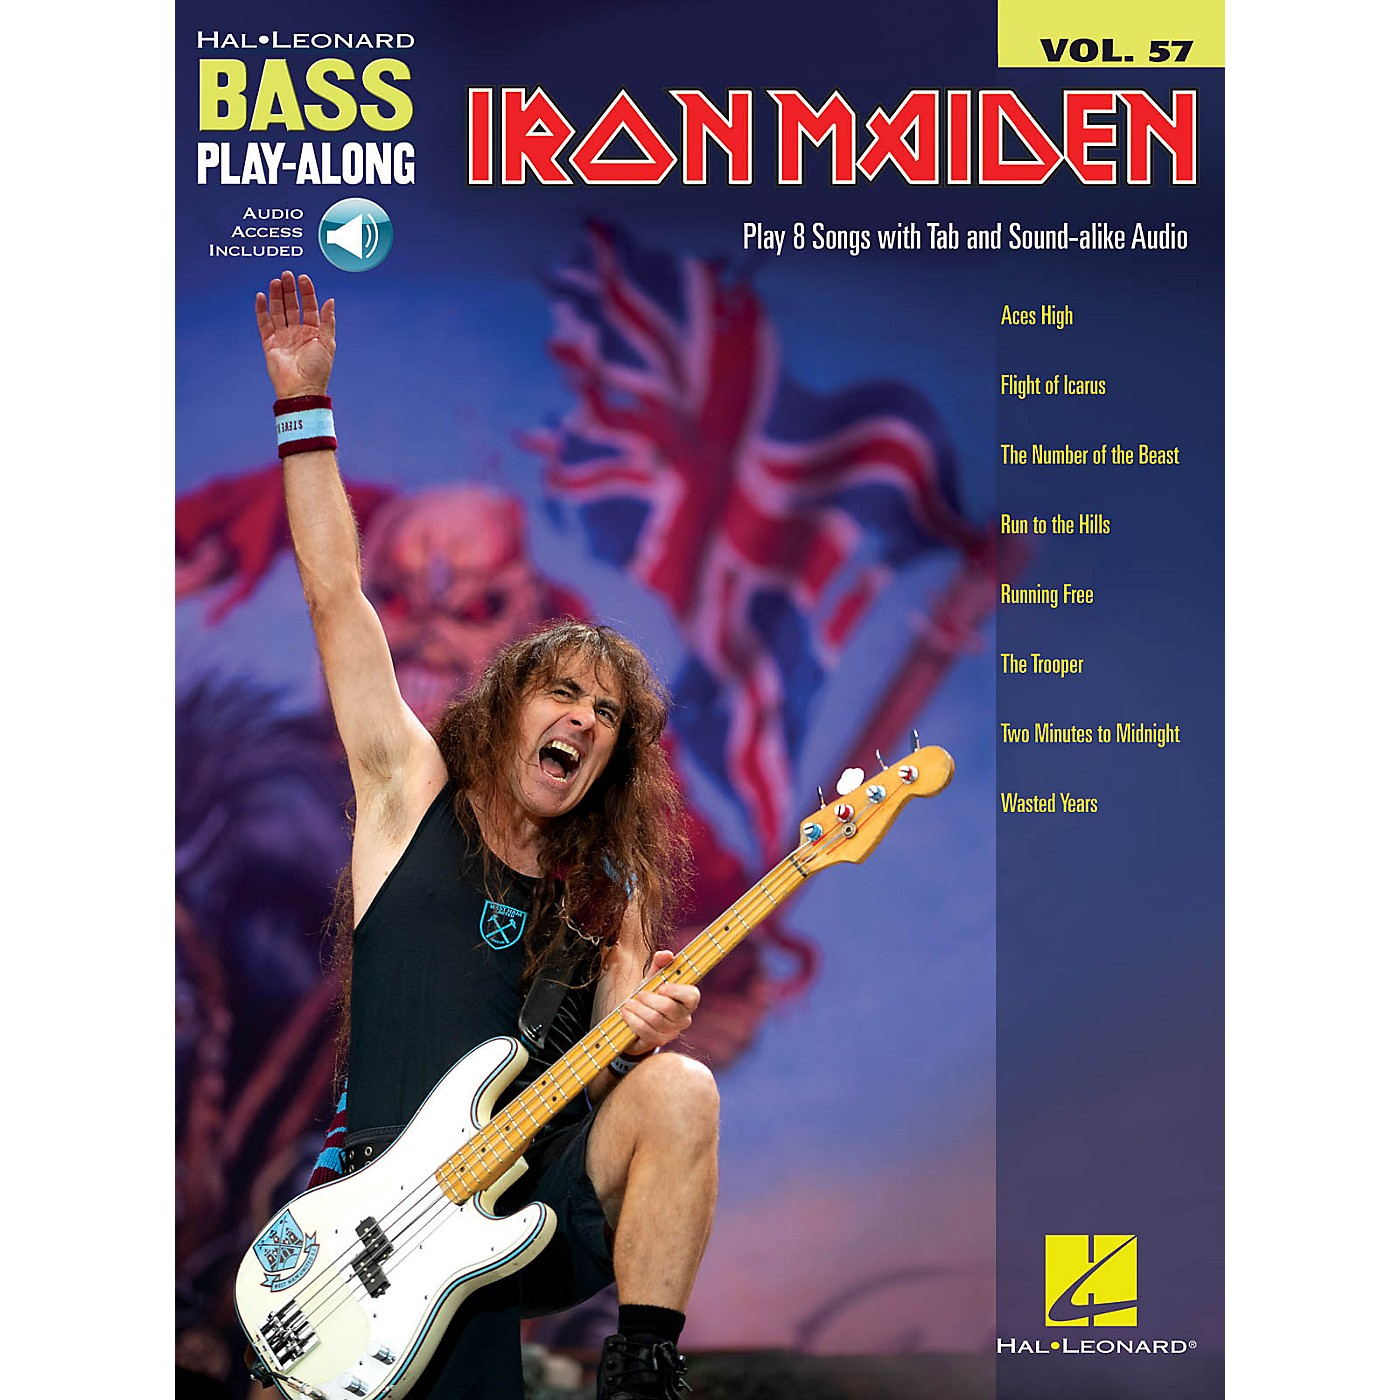 Hal Leonard Iron Maiden Bass Play-Along Volume 57 Book/Audio Online thumbnail